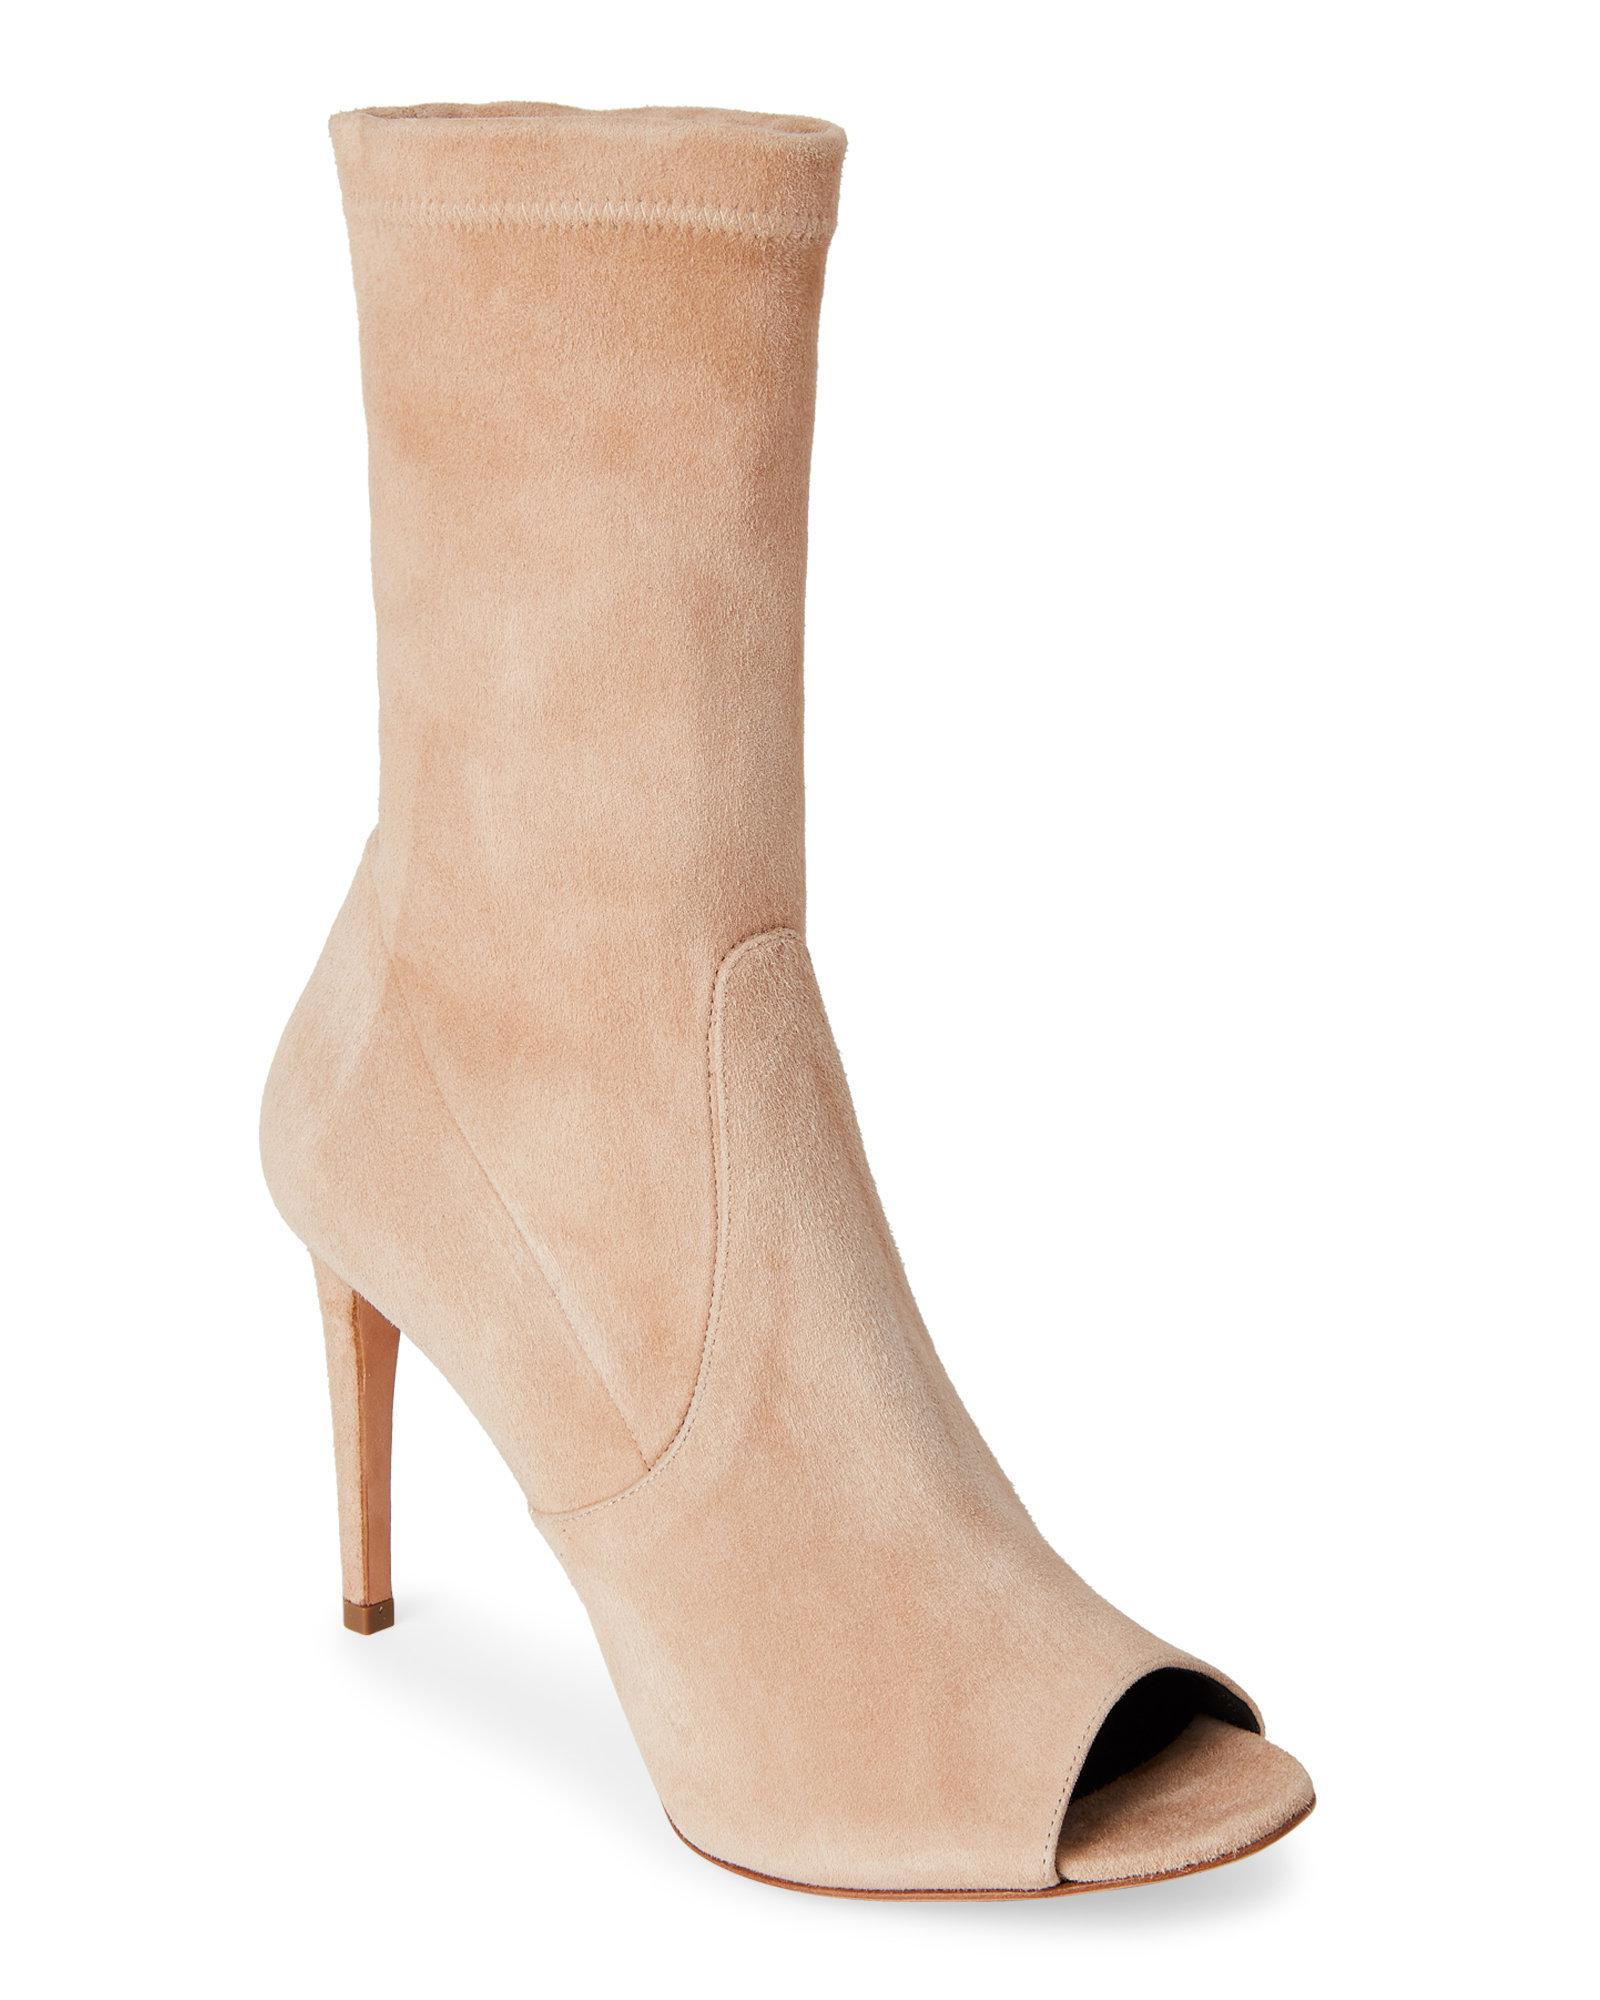 Jean-Michel Cazabat Cutout Peep-Toe Ankle Boots classic cheap price fashionable cheap online 79i0e9